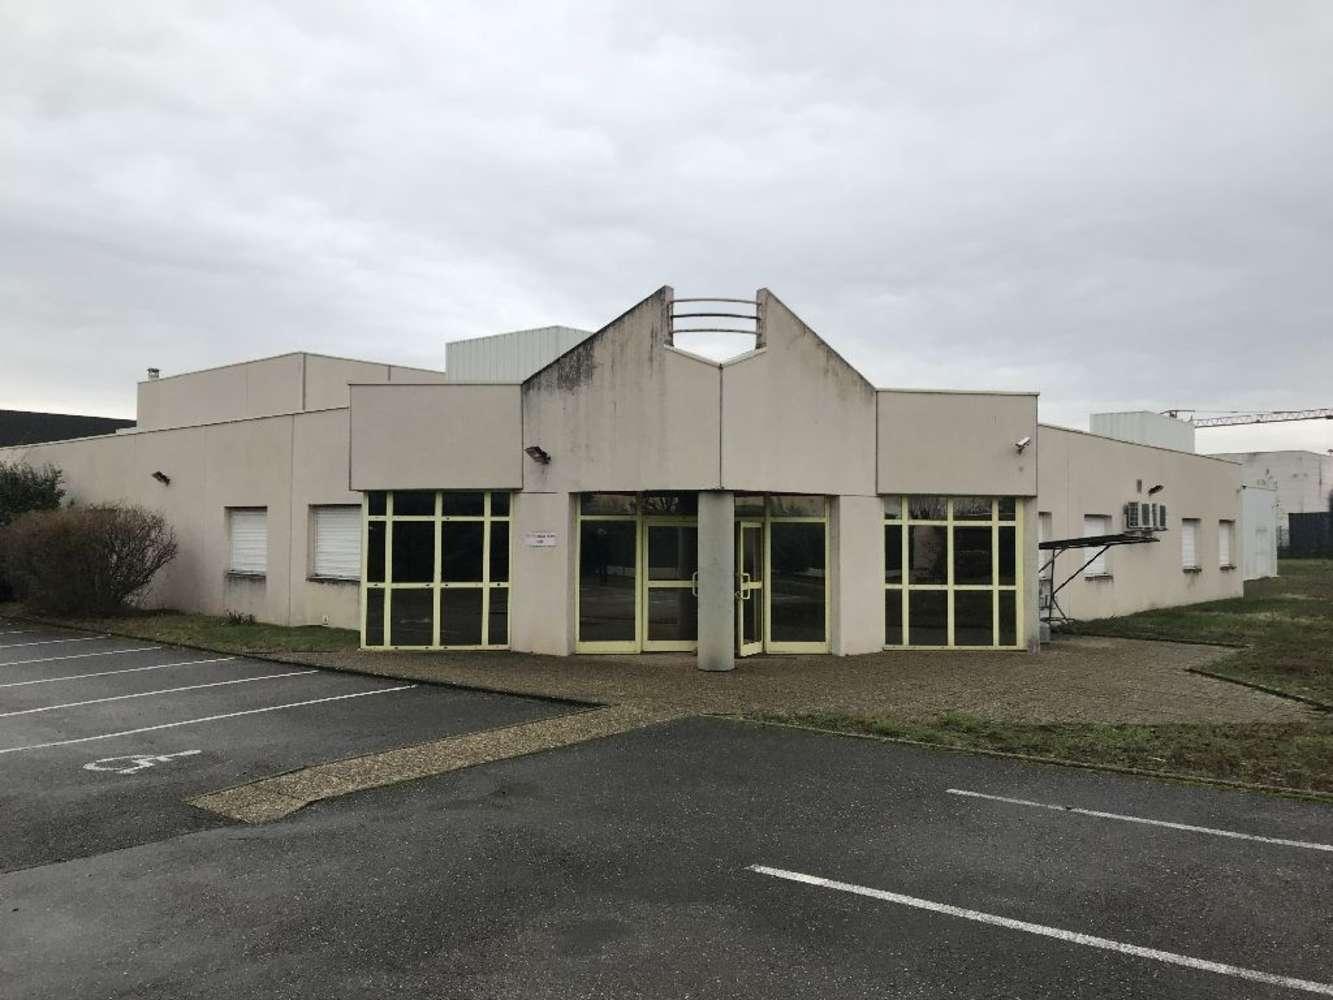 Activités/entrepôt Meyzieu, 69330 - Entrepot à vendre Meyzieu (Lyon Est) - 9862431